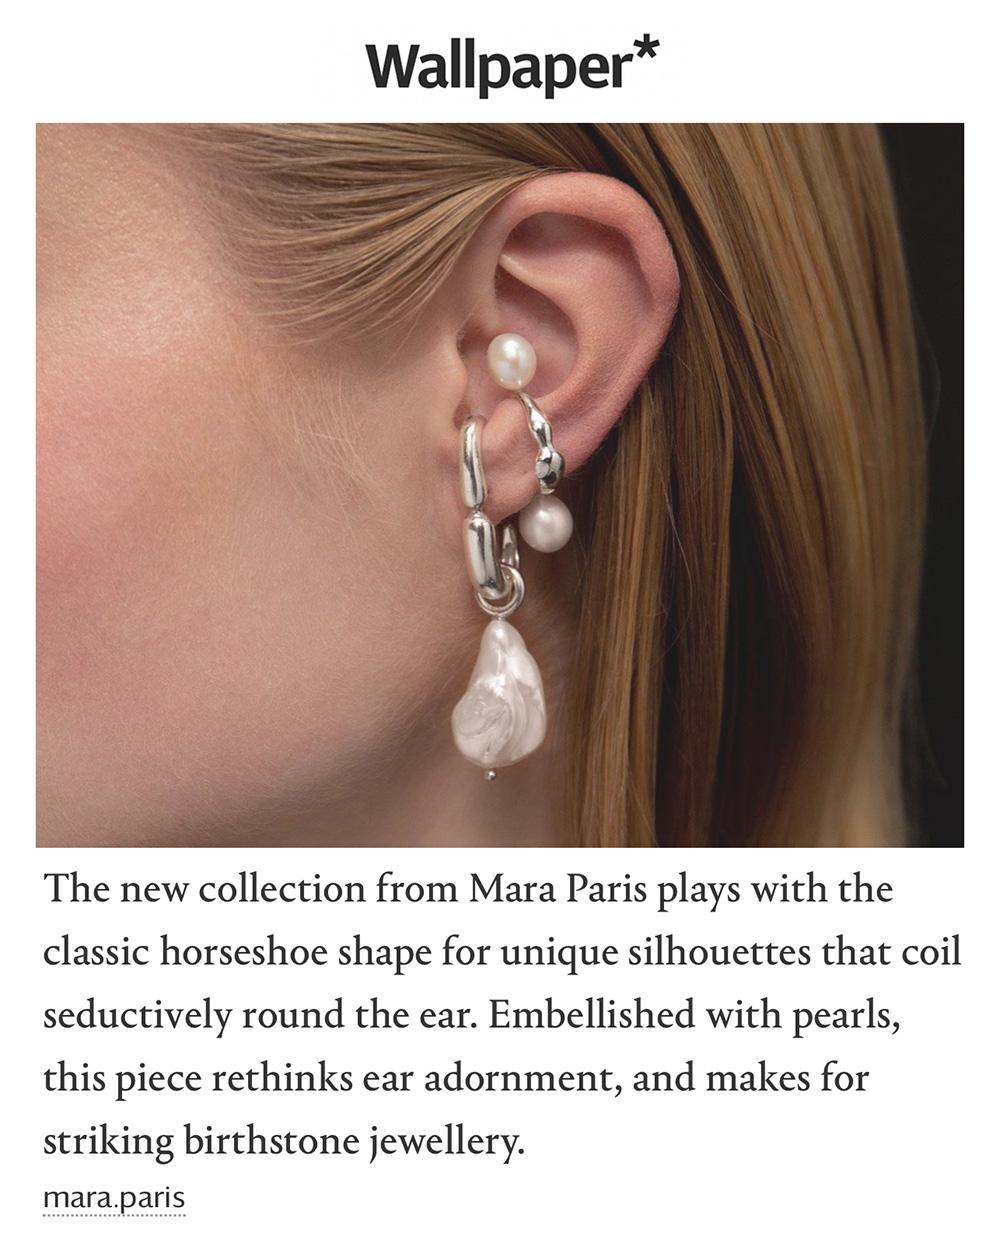 Wallpaper - Birthstone jewellery